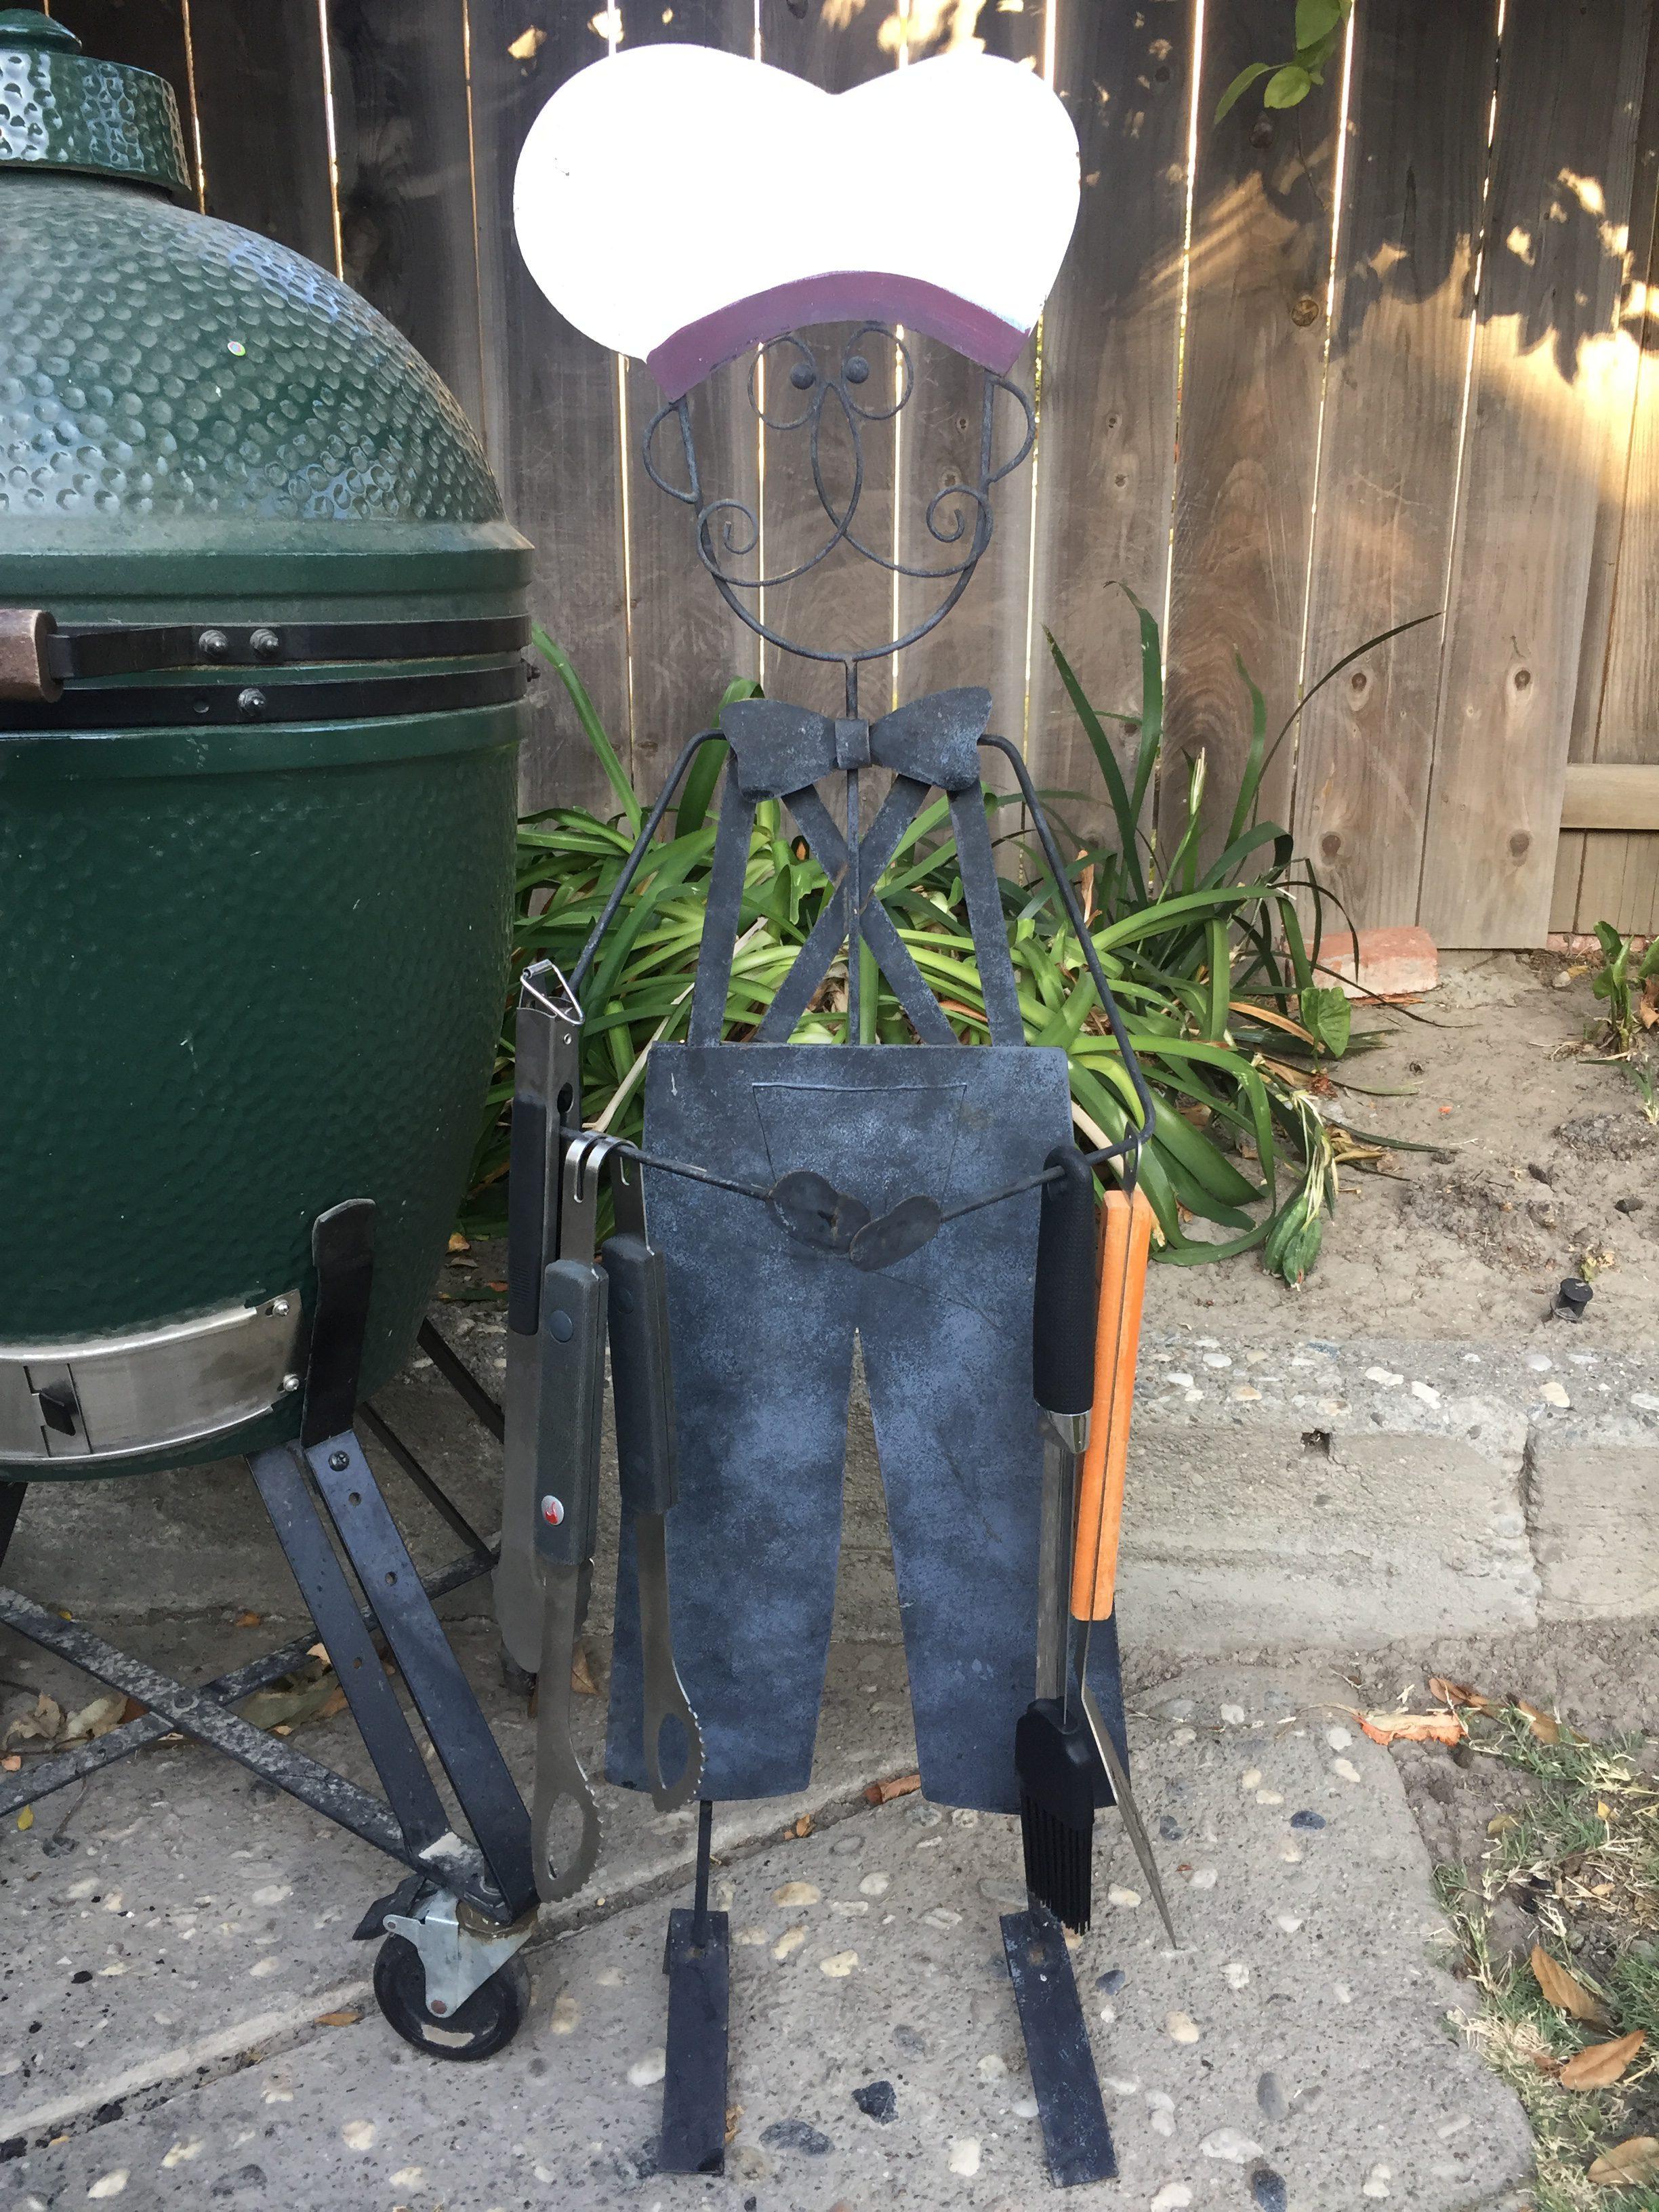 The Grilling Life, Flat Pat My BBQ Buddy